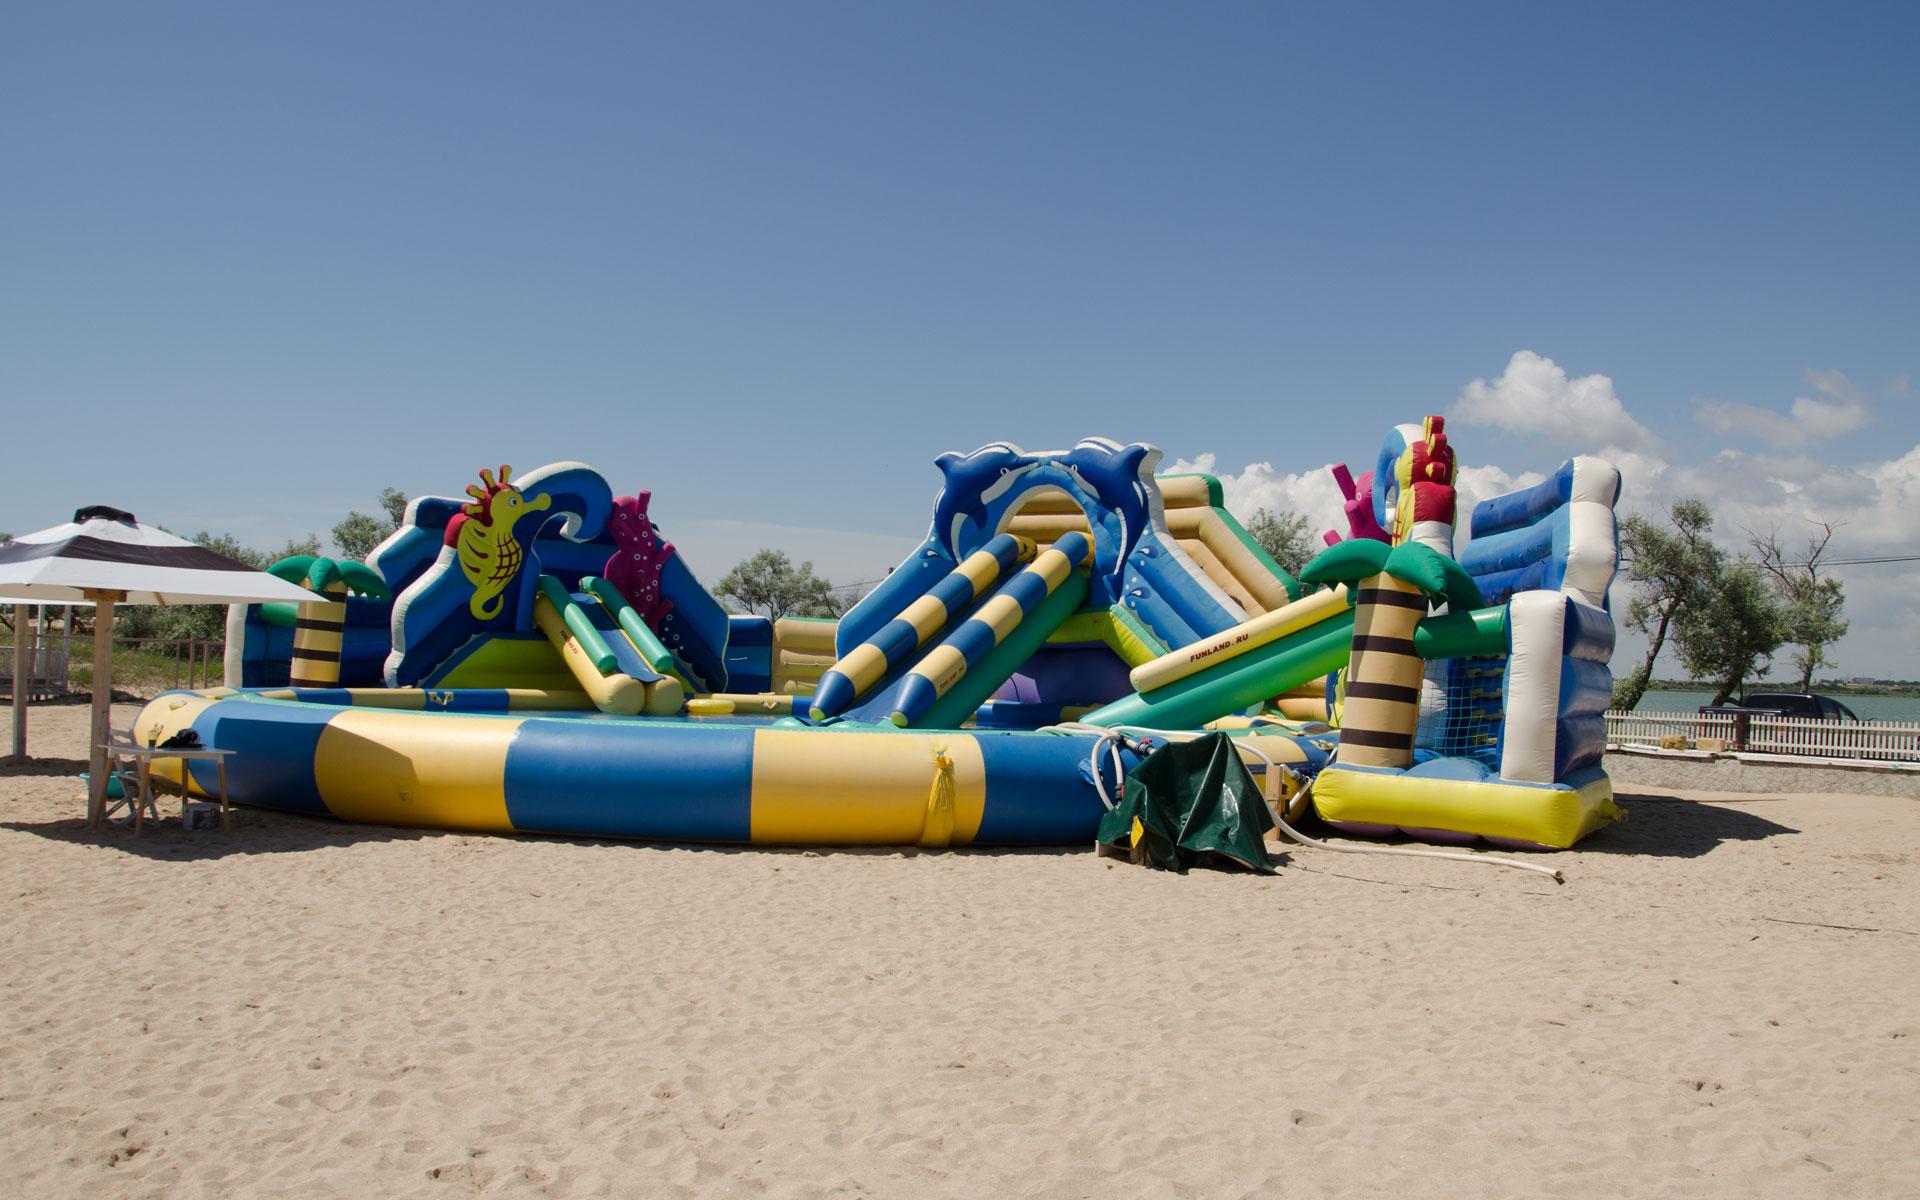 Детские развлечения на пляже Евпатории. Фото Евпатории